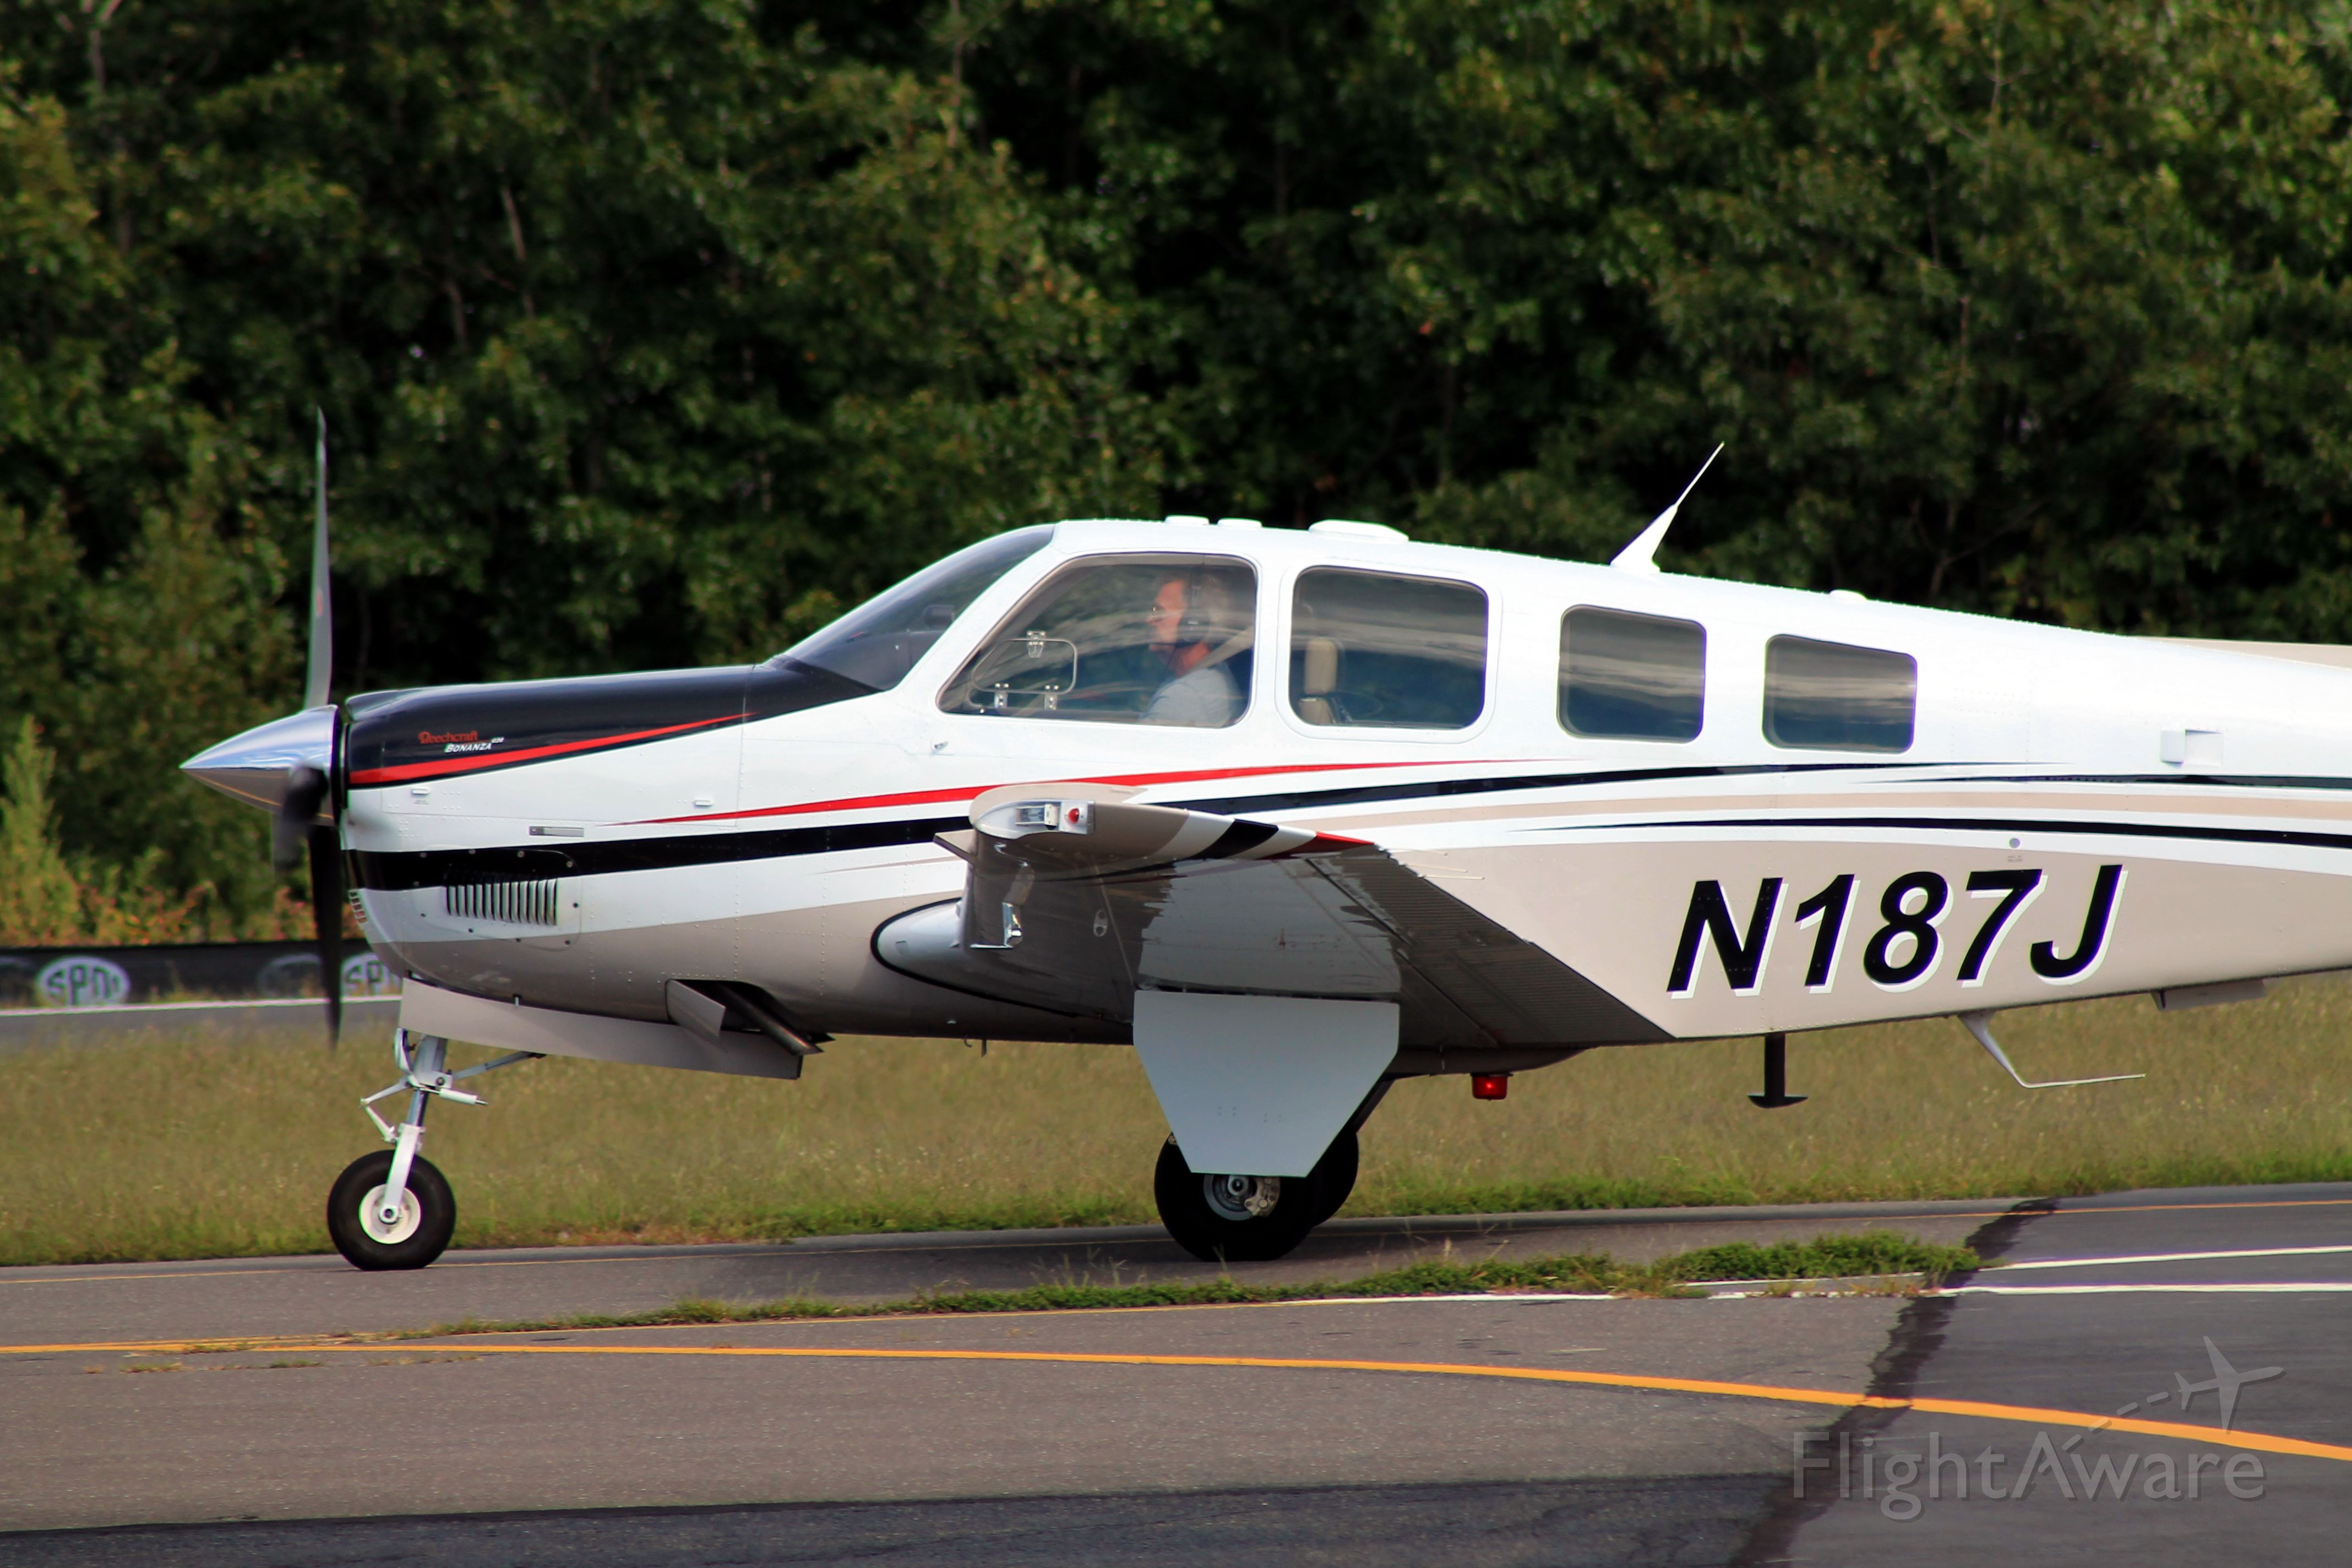 Beechcraft Bonanza (36) (N187J) - Taken on September 7, 2013.